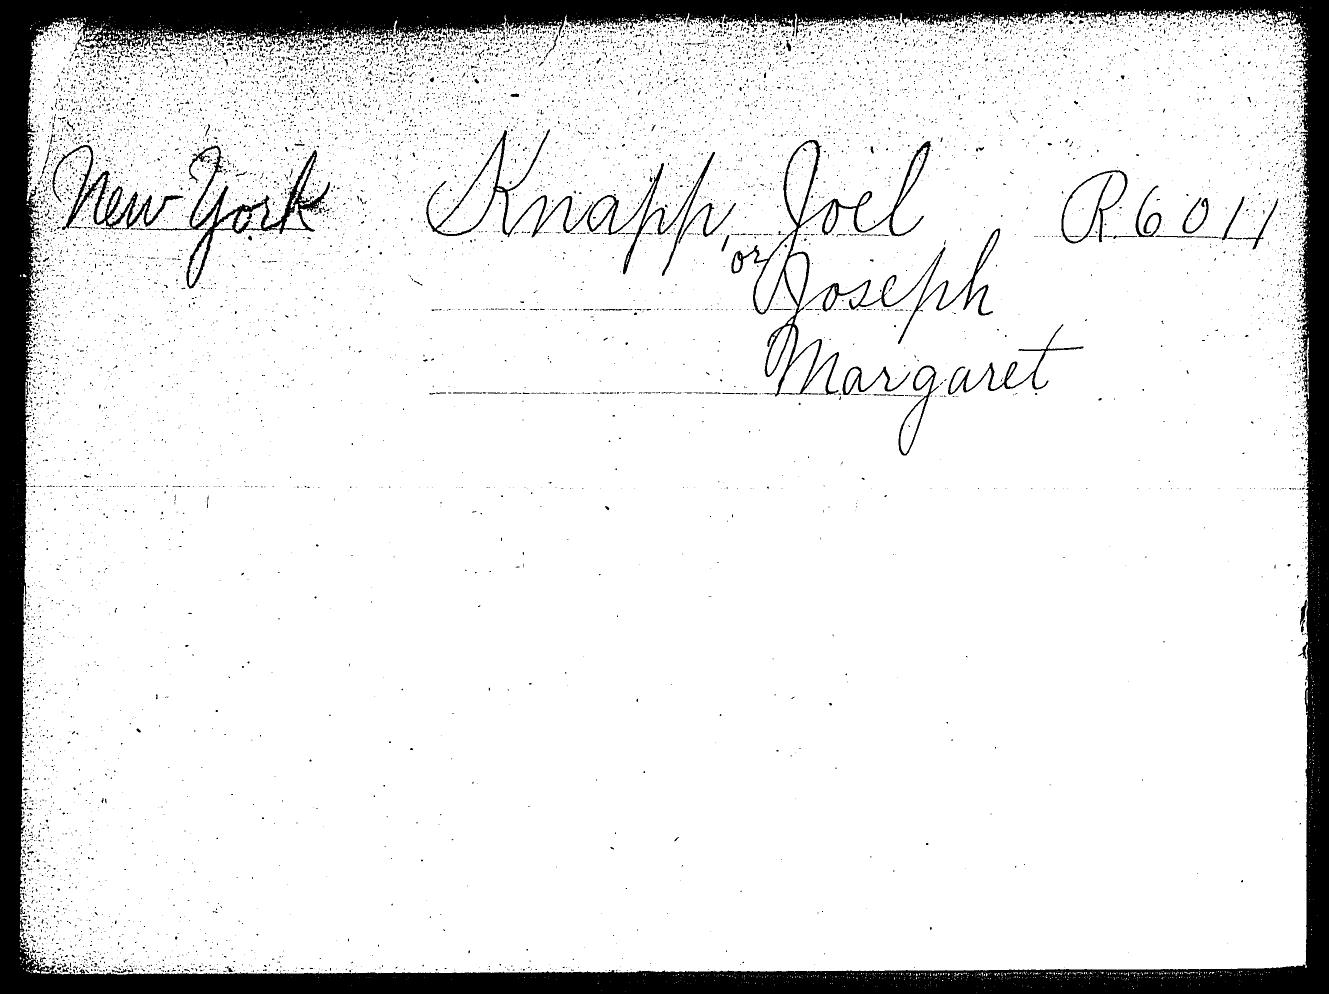 Joseph Knapp